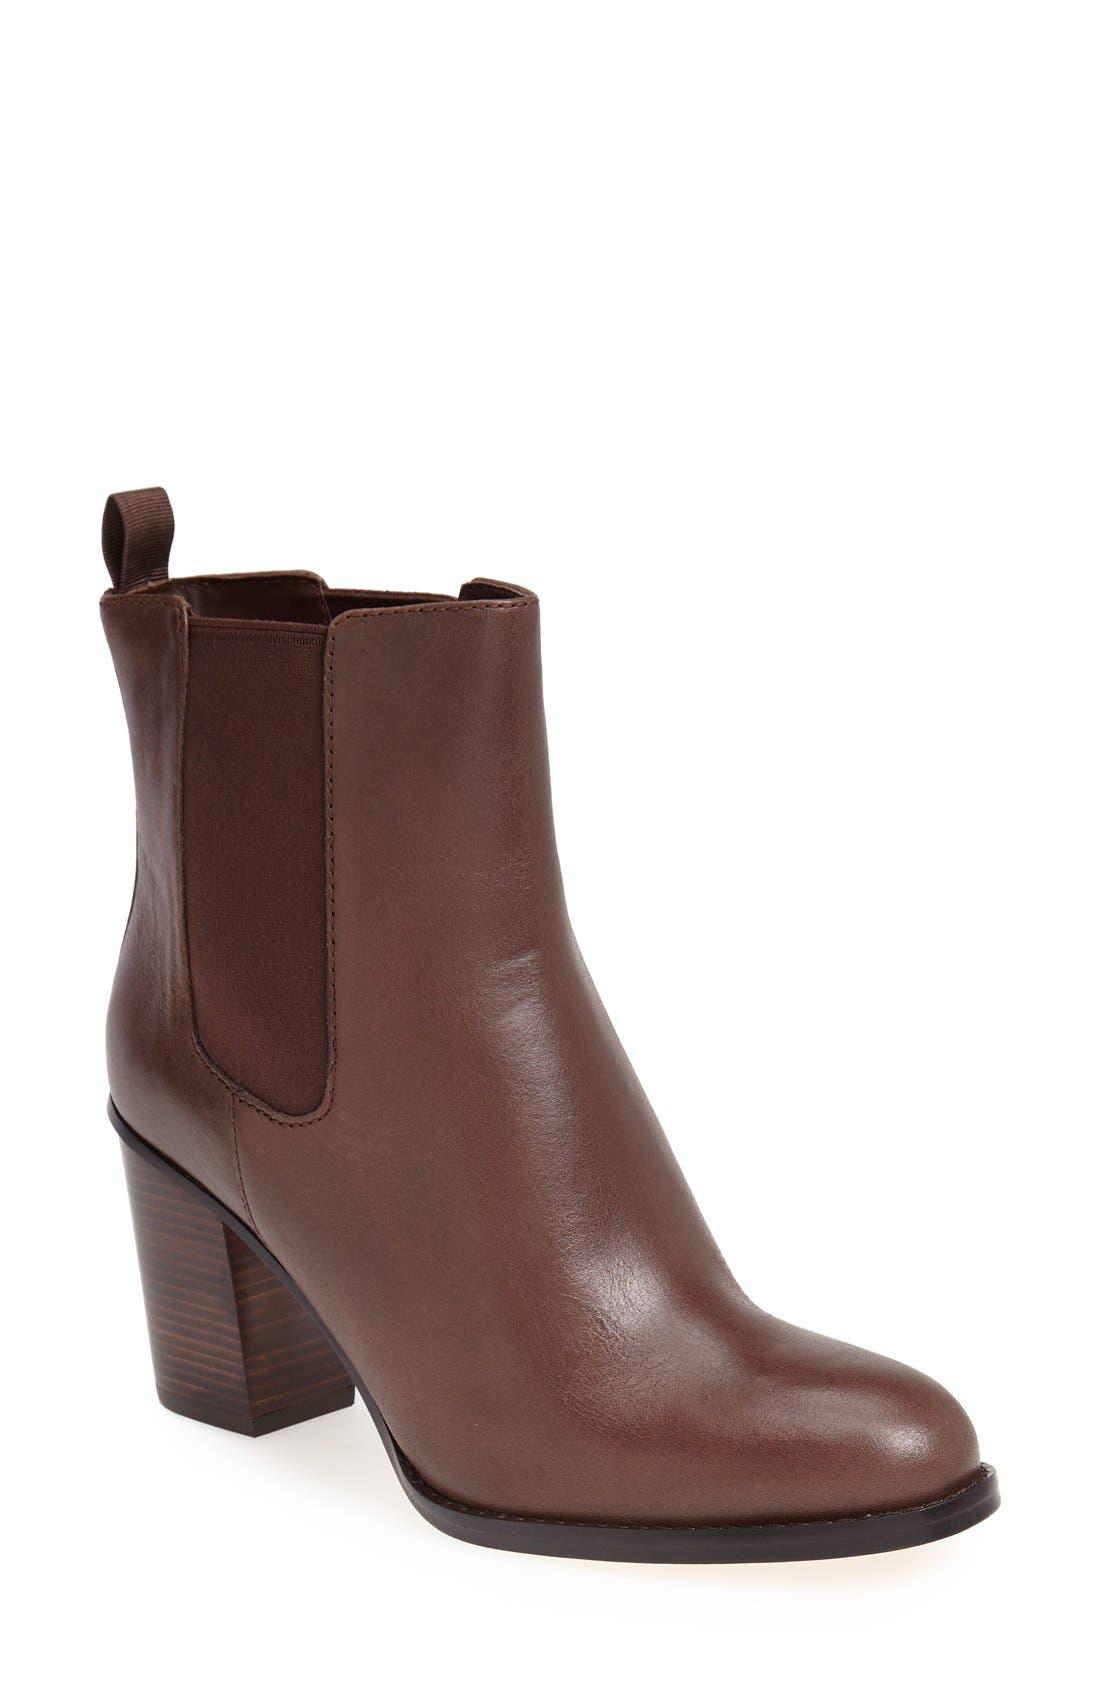 Alternate Image 1 Selected - Cole Haan 'Draven' Chelsea Boot (Women)